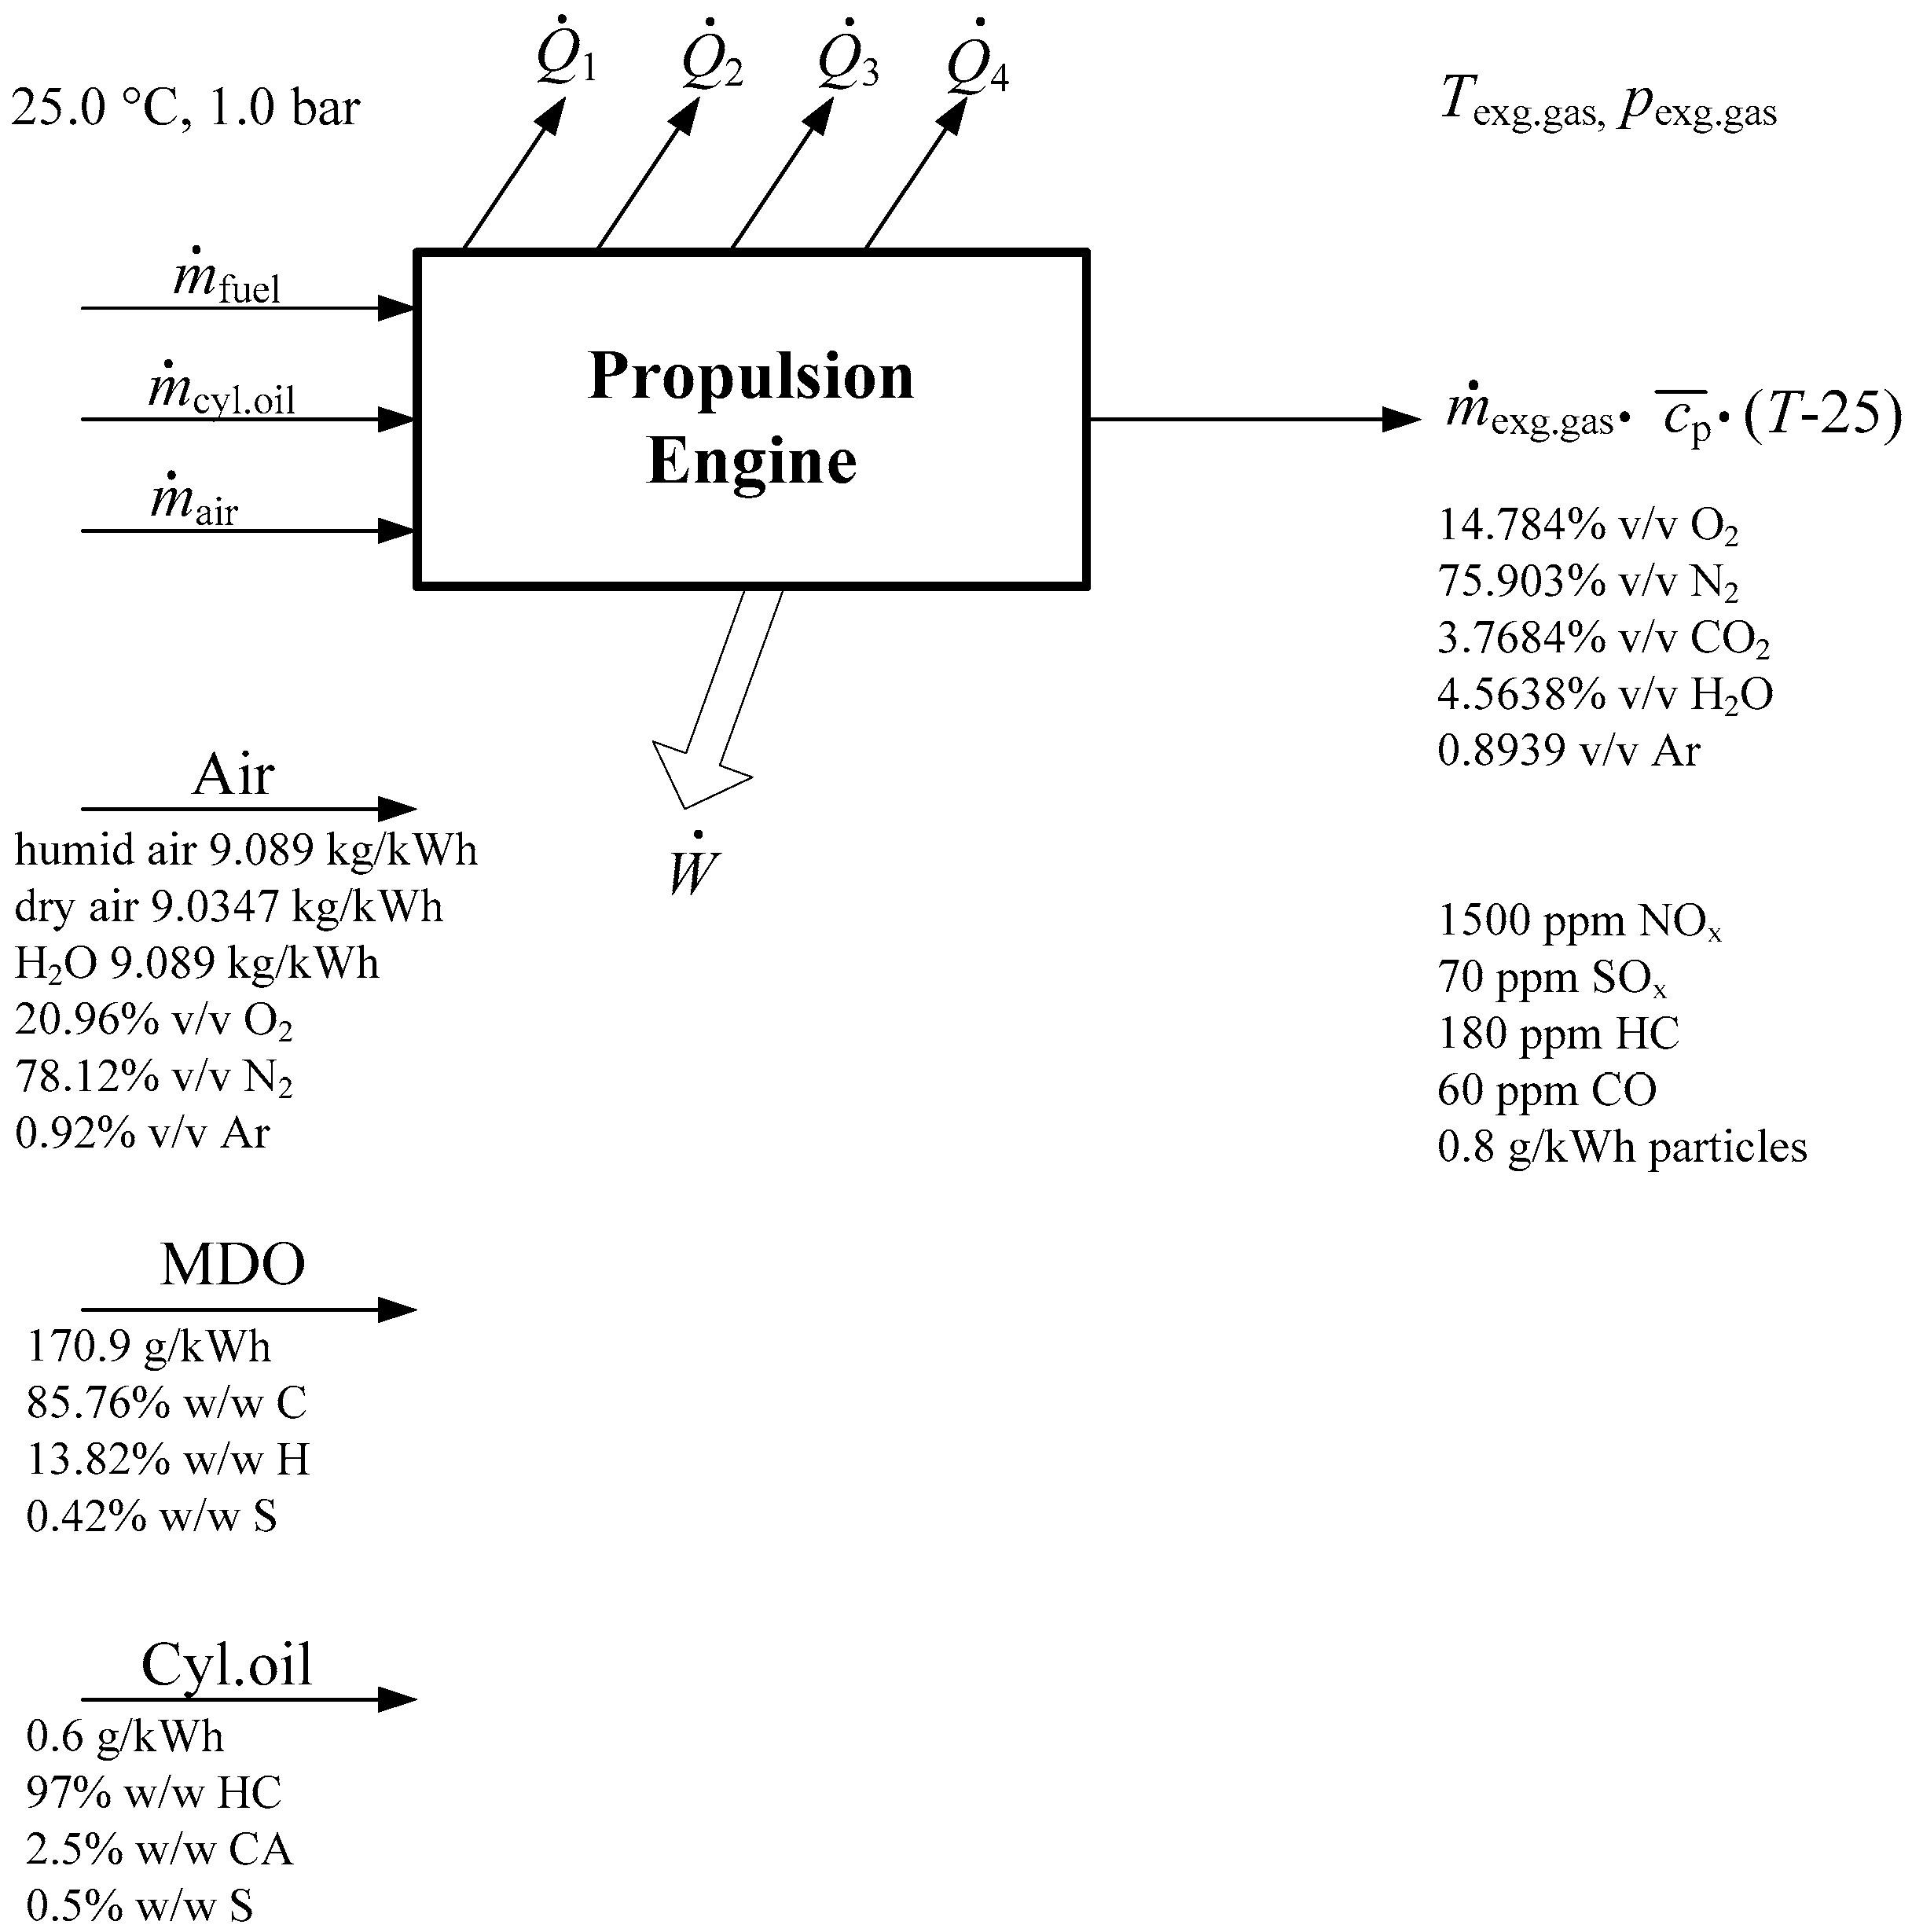 Valve Timing Diagram for 4 Stroke Petrol Engine Energies Free Full Text Of Valve Timing Diagram for 4 Stroke Petrol Engine